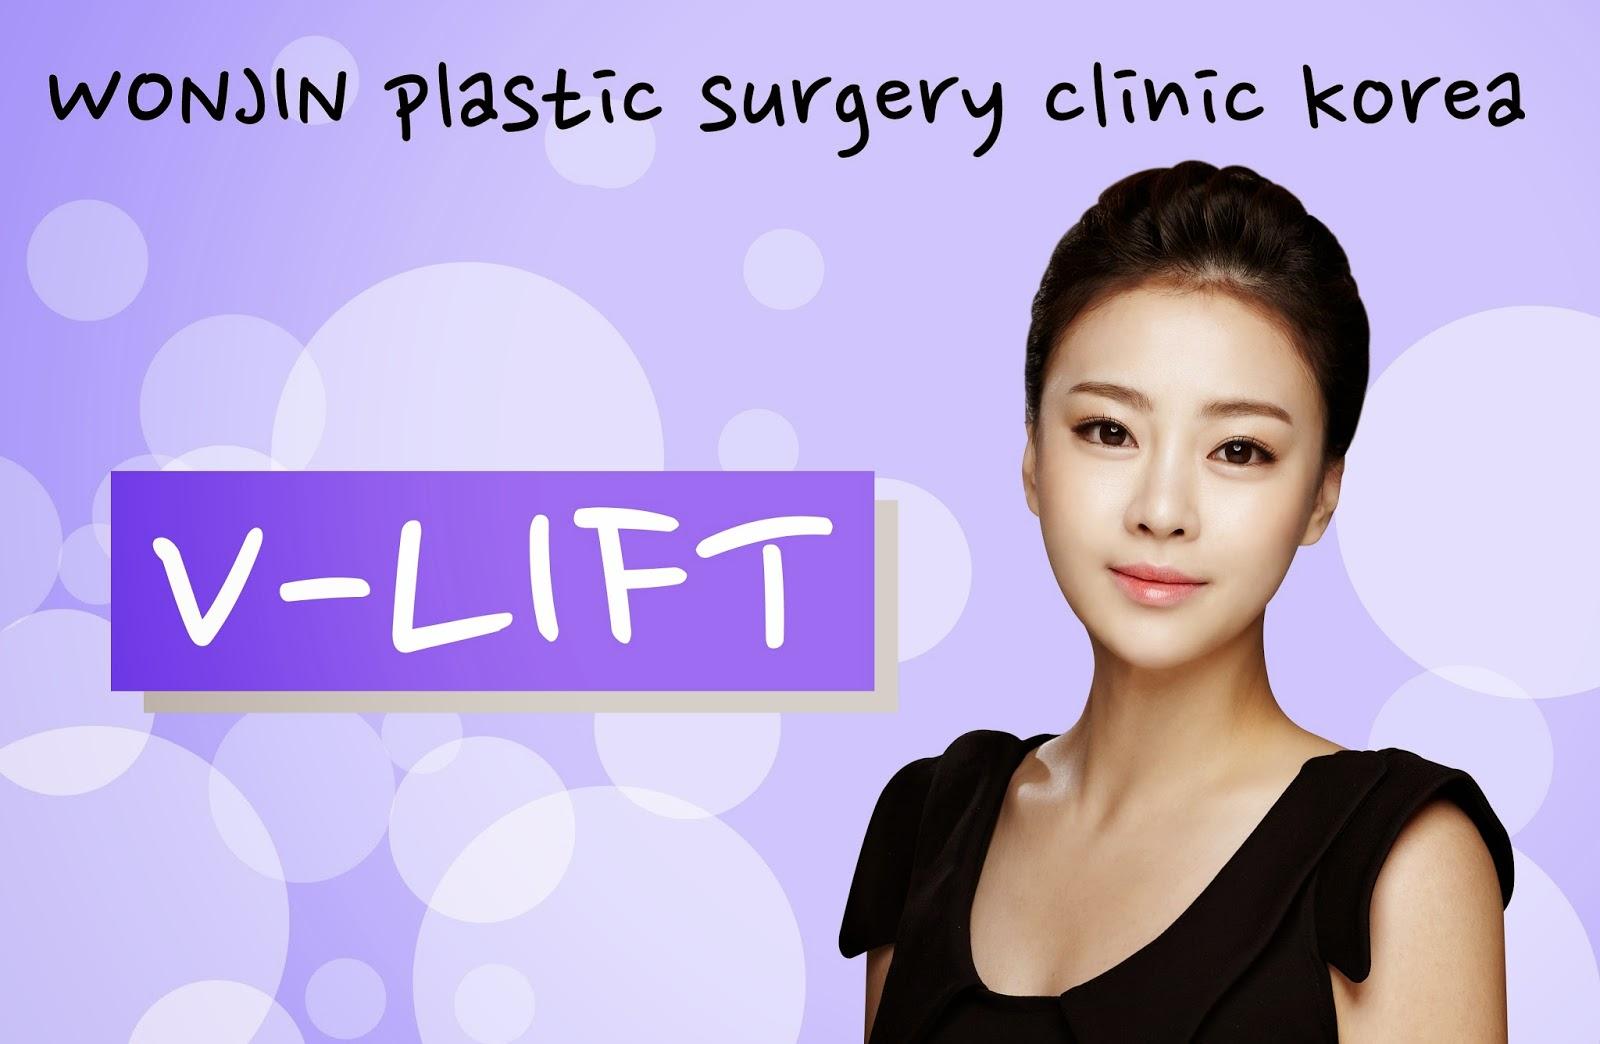 wonjin-plastic-surgery-clinic-korea